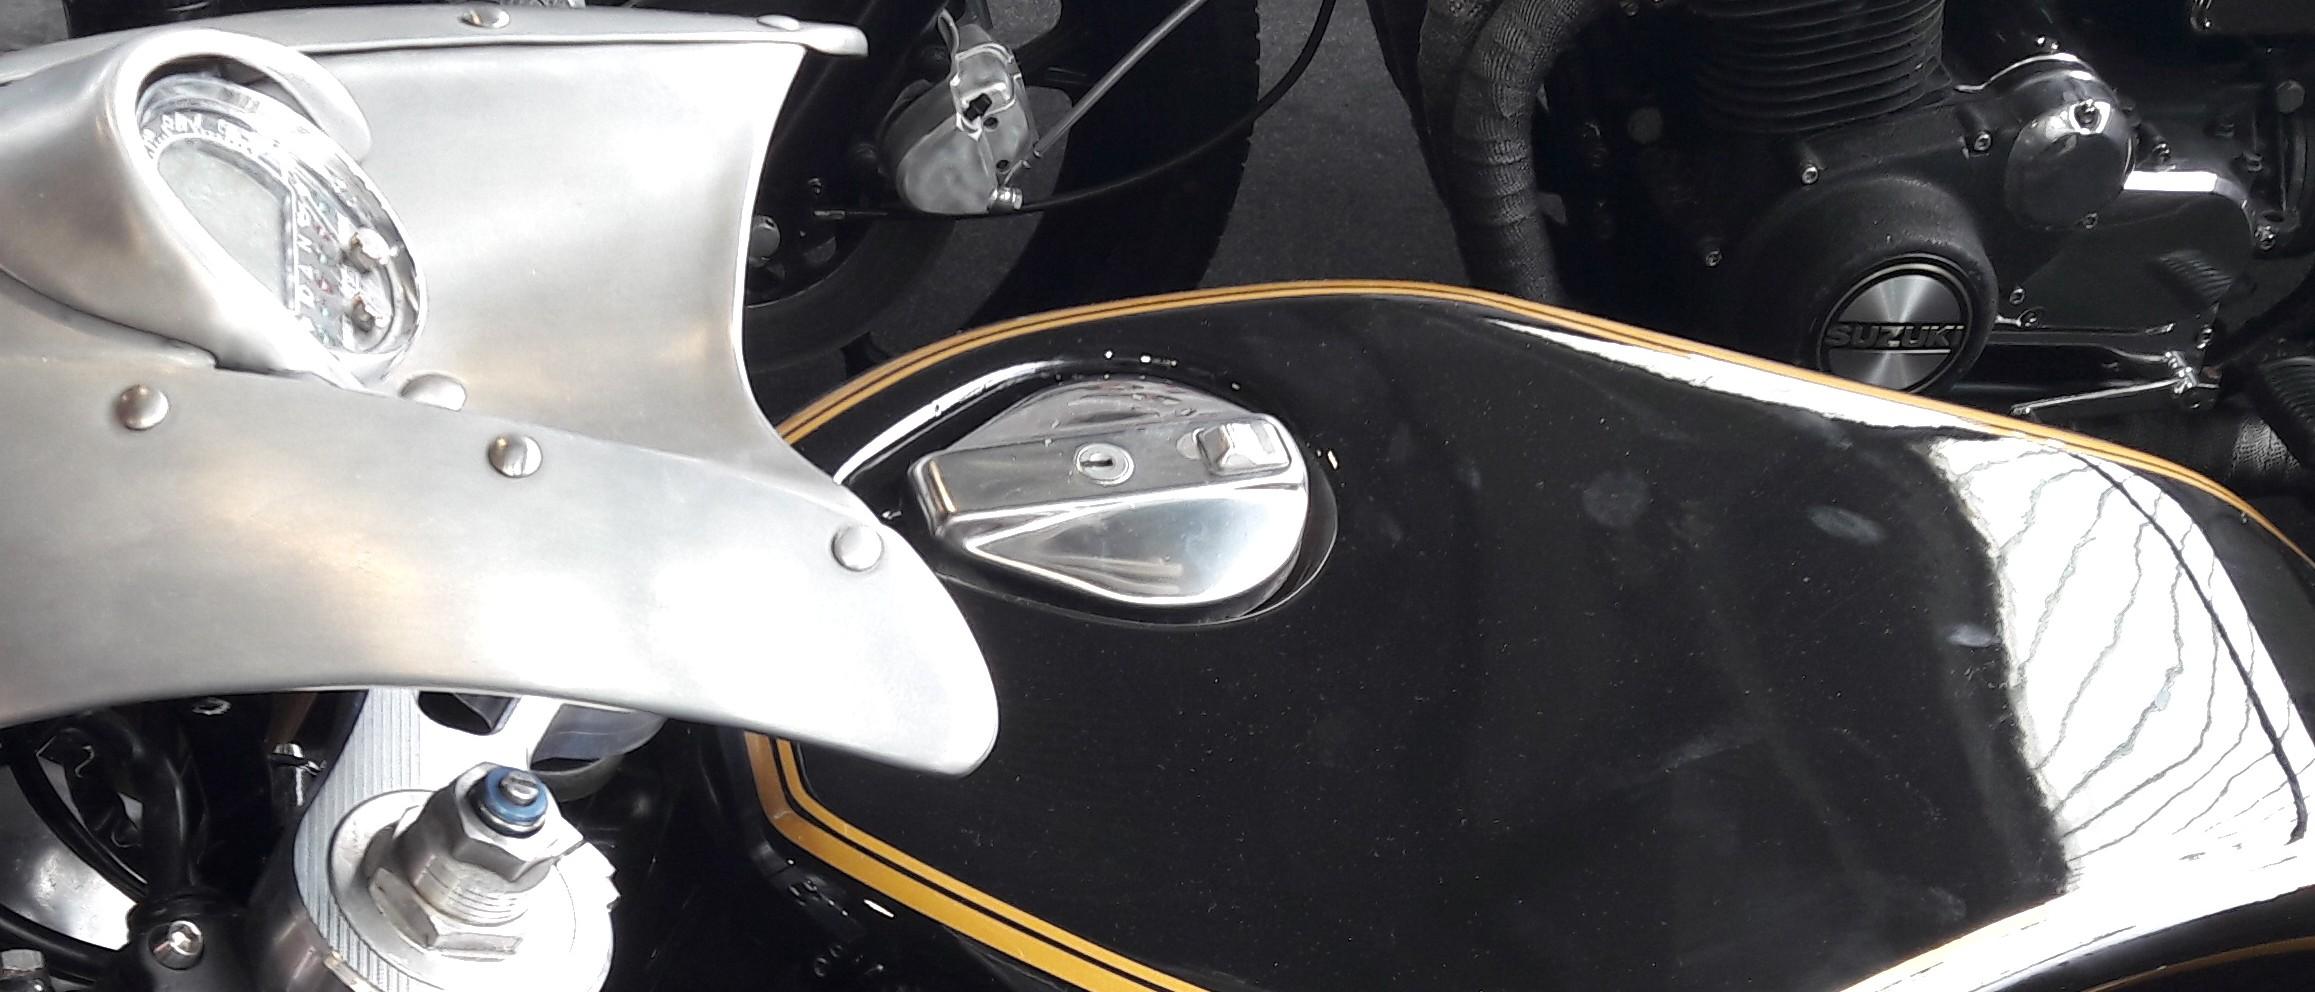 Moto custom con tappo serbatoio PN.BKE al Motor Bike Expo Verona 2018